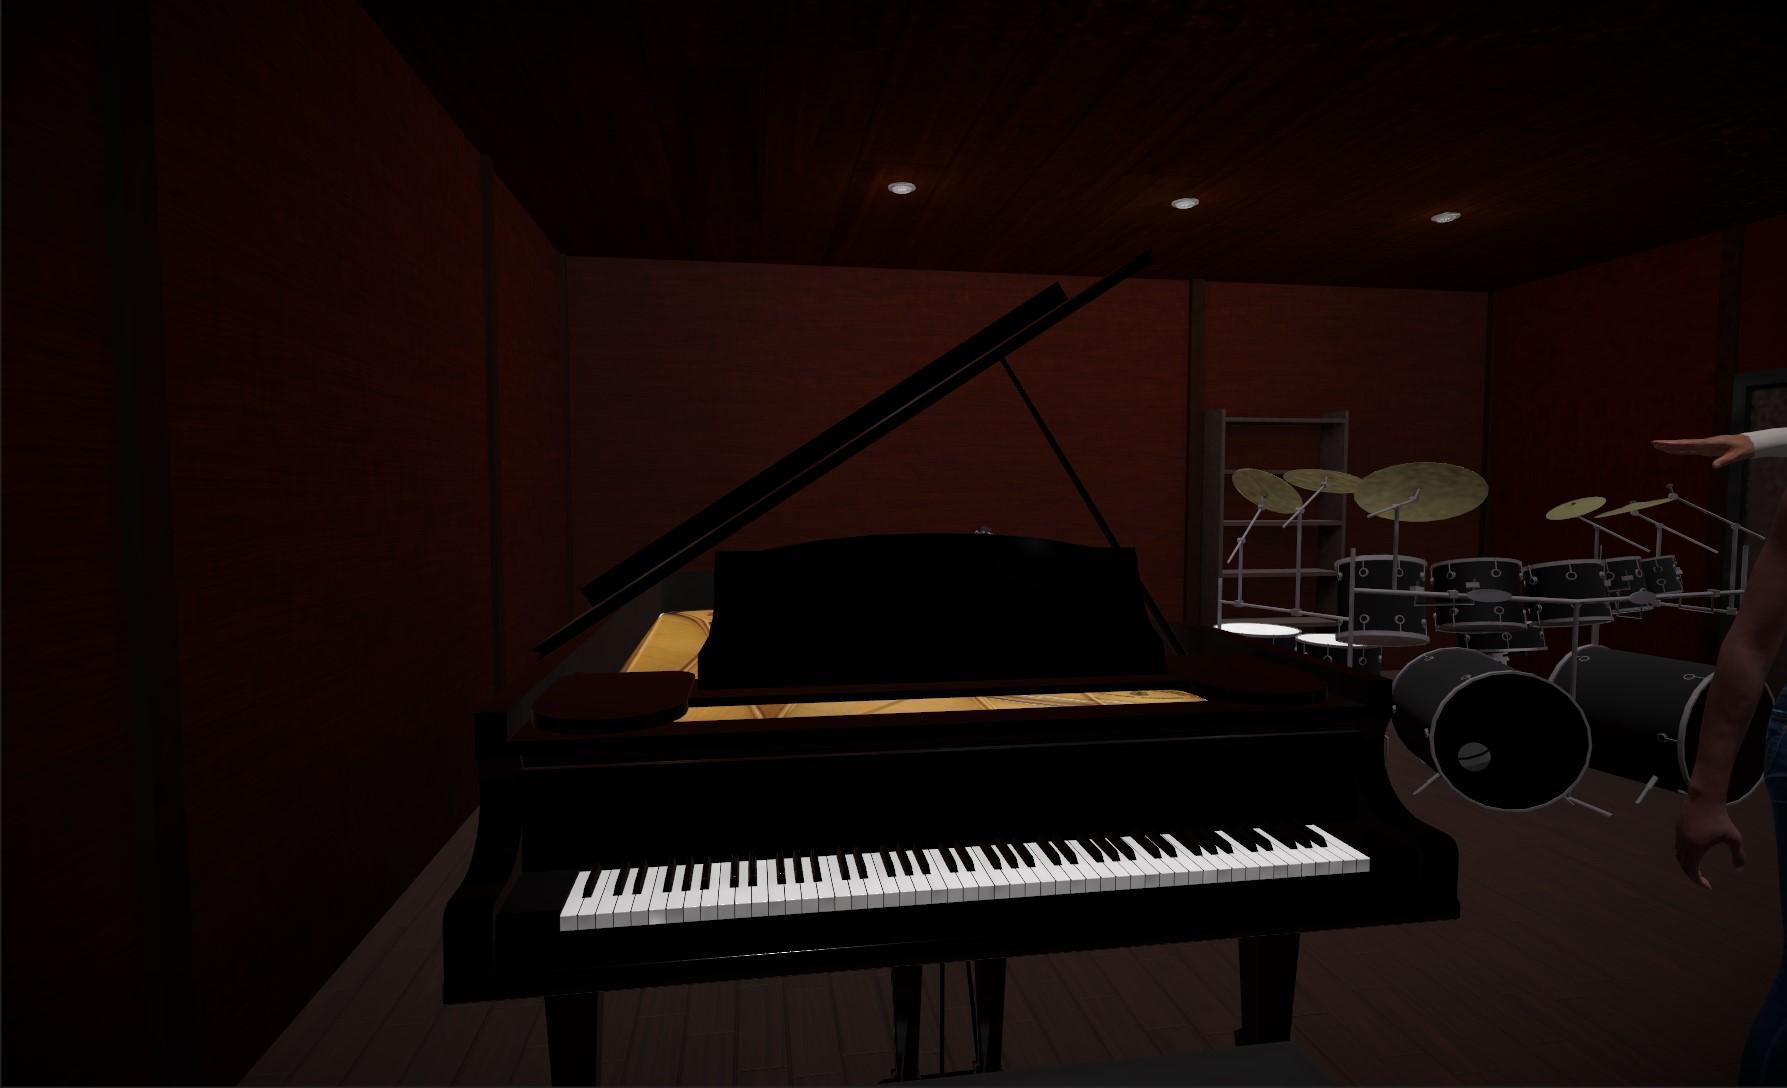 Piano in recording room of virtual recording studio